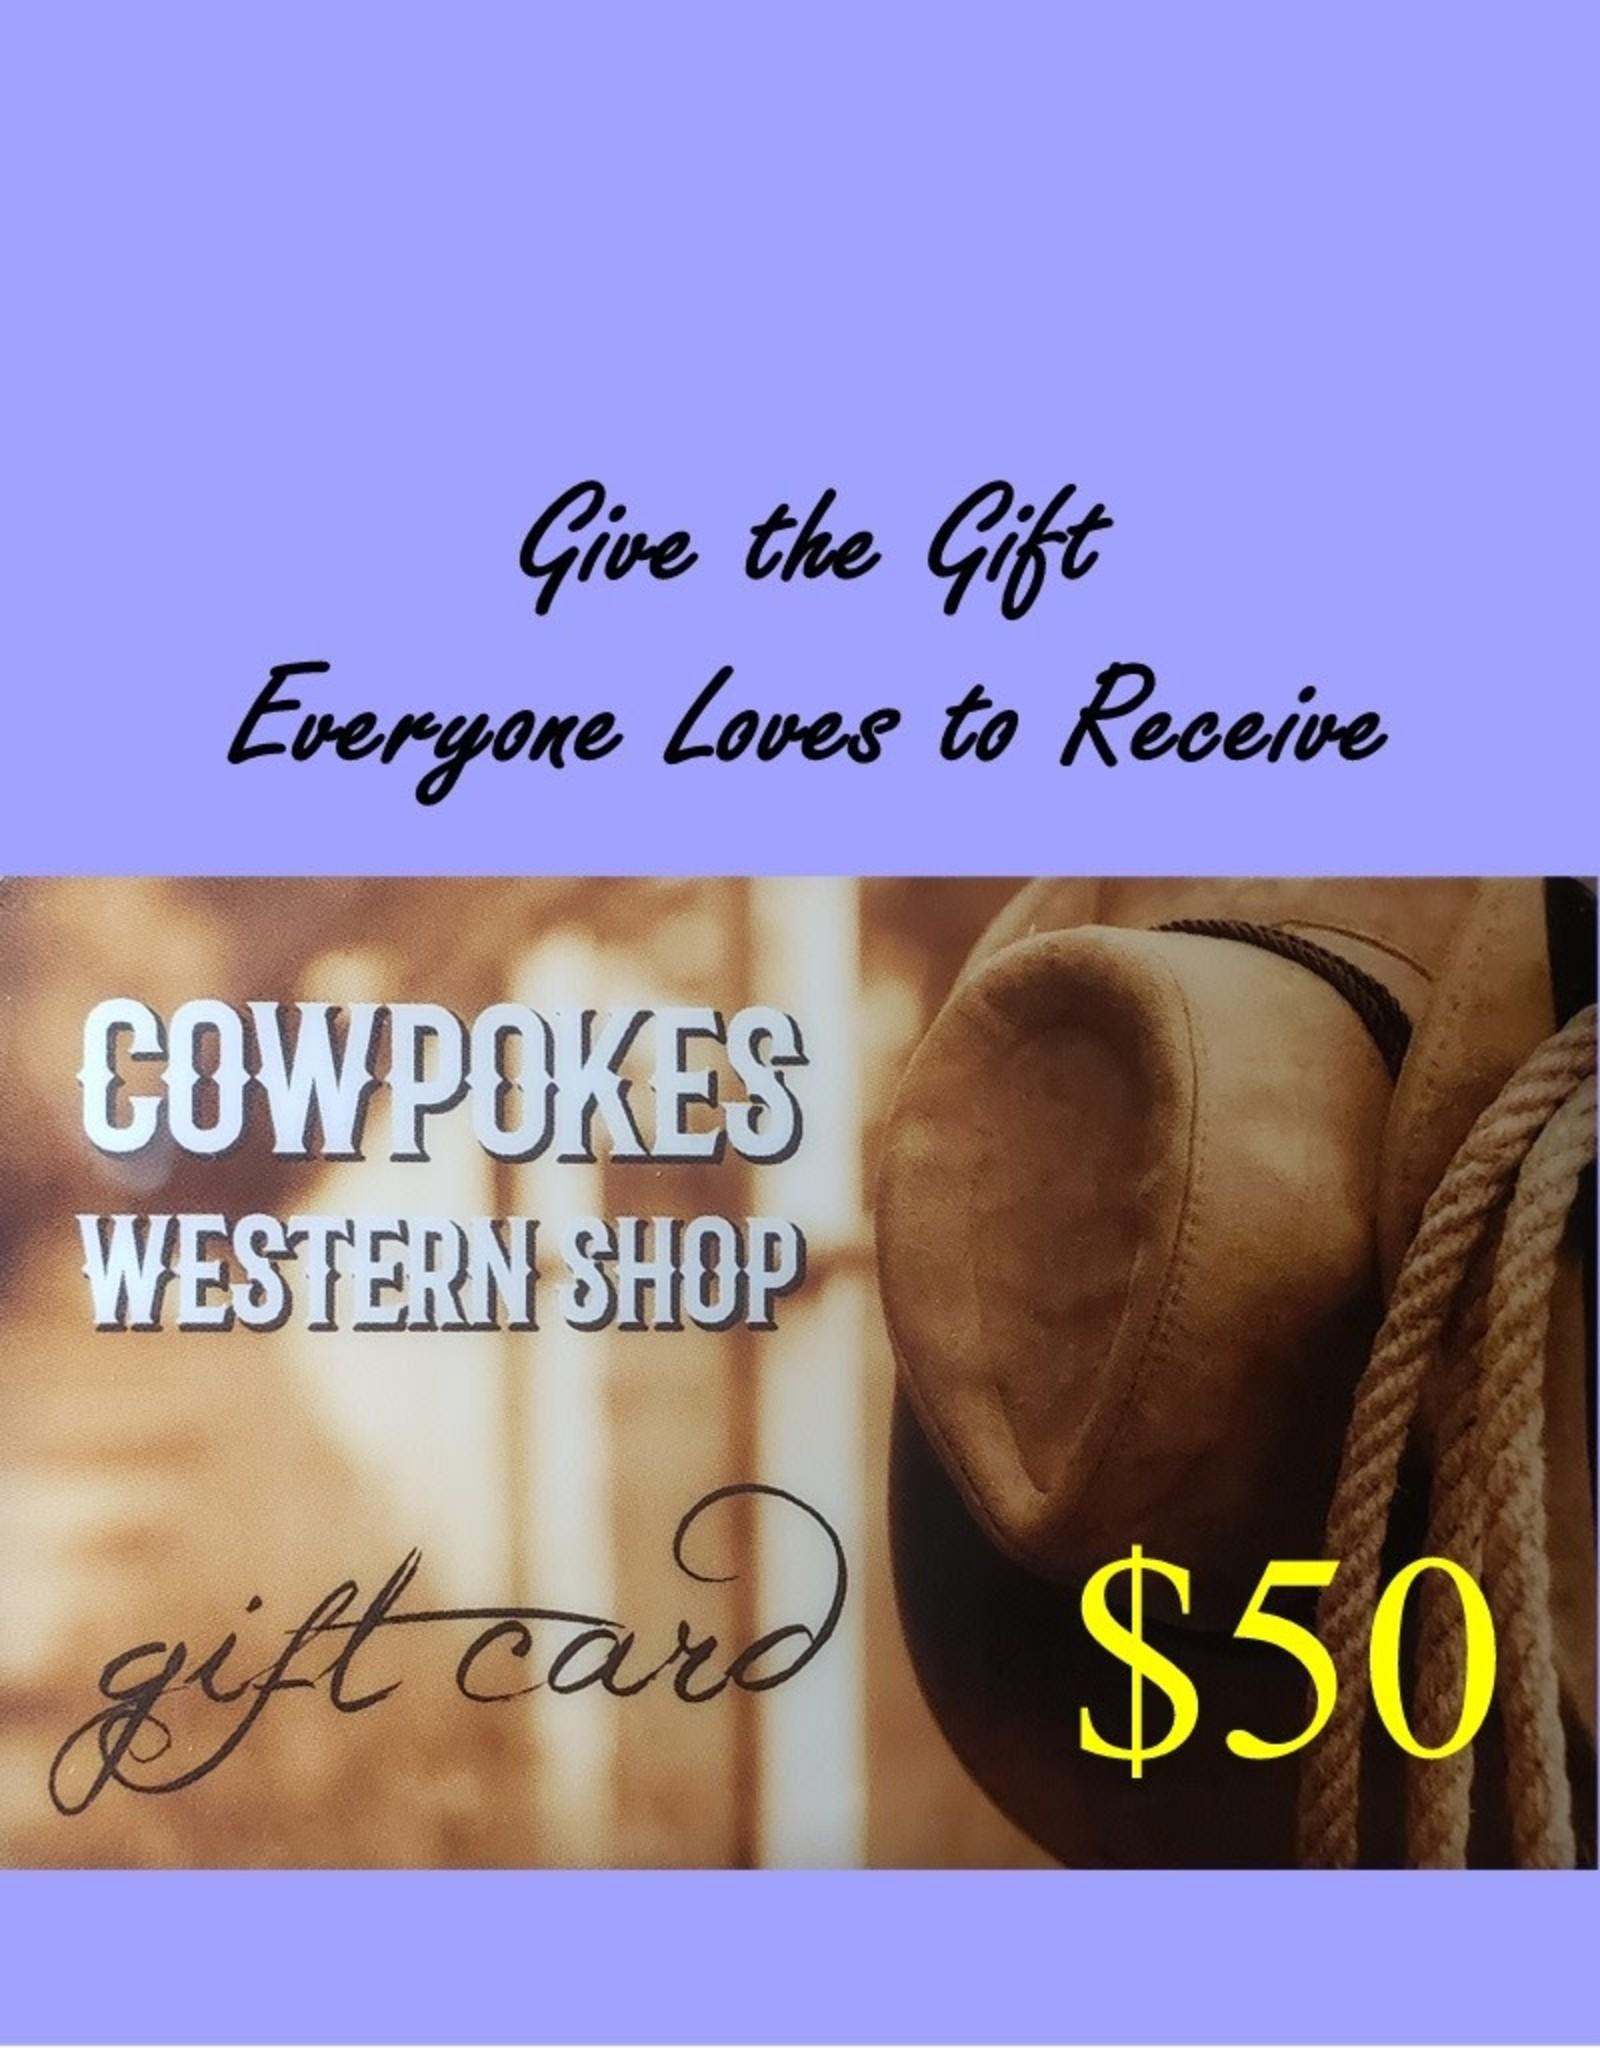 Cowpokes Western Shop Gift Card $50